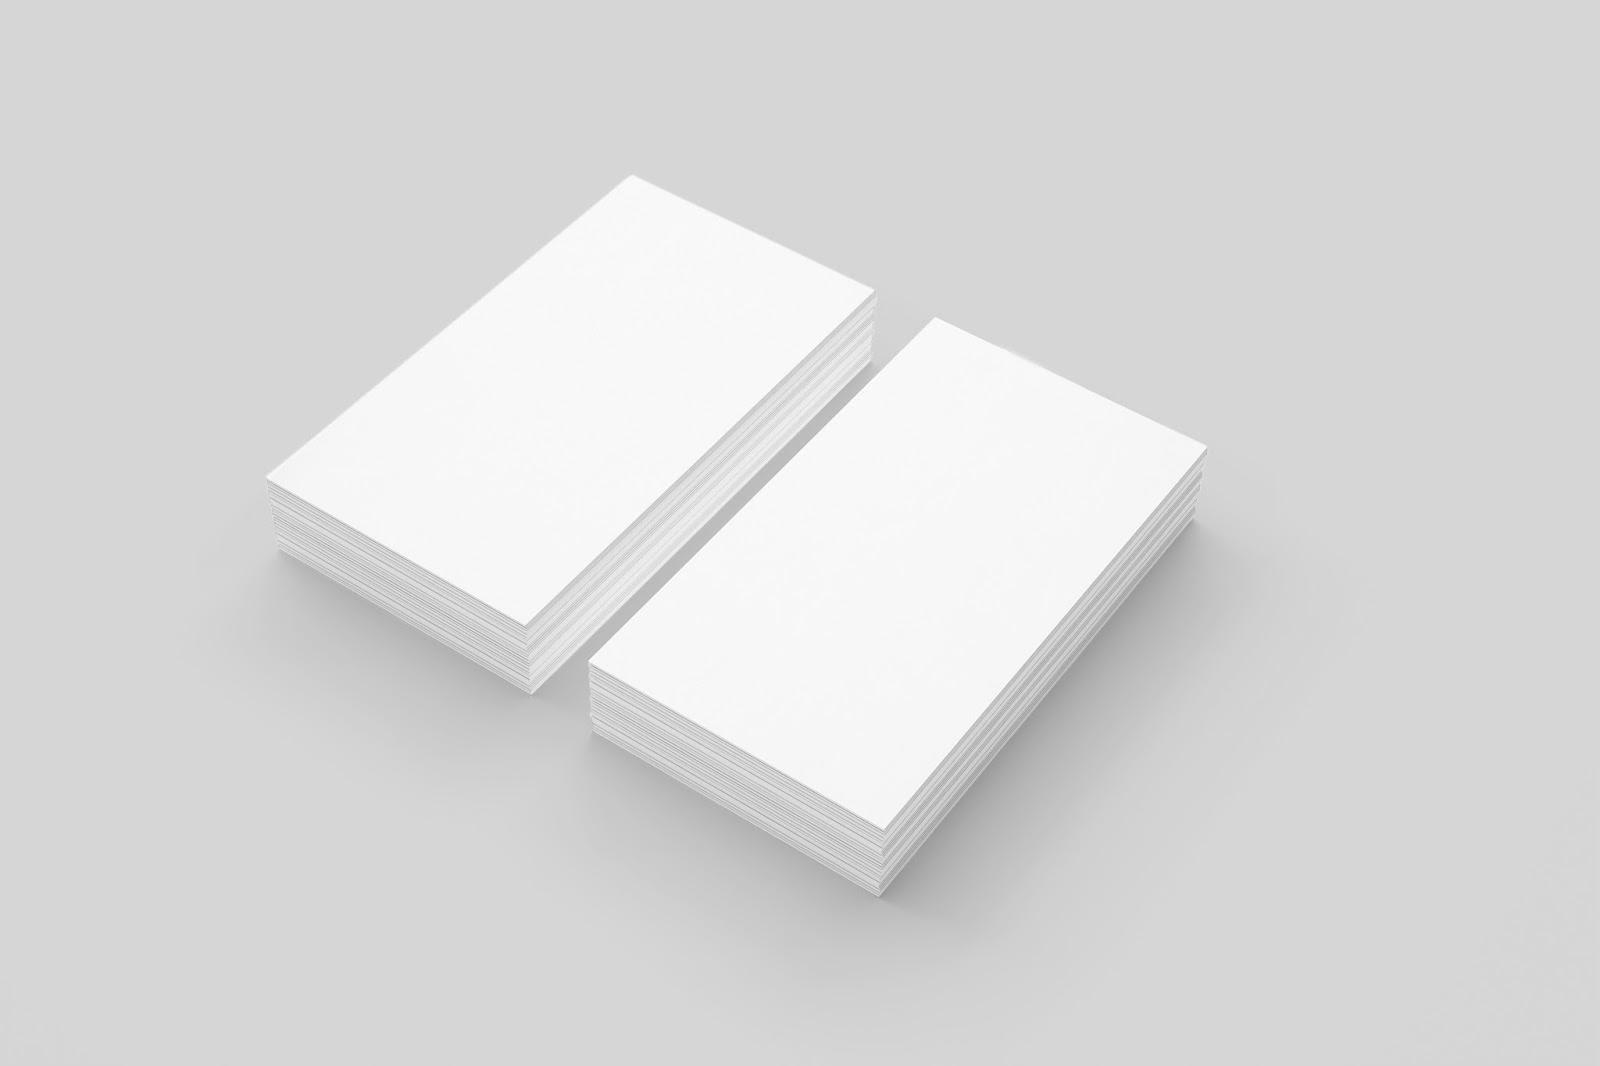 12 Visiting Card Templates - DOC PDF PSD EPS